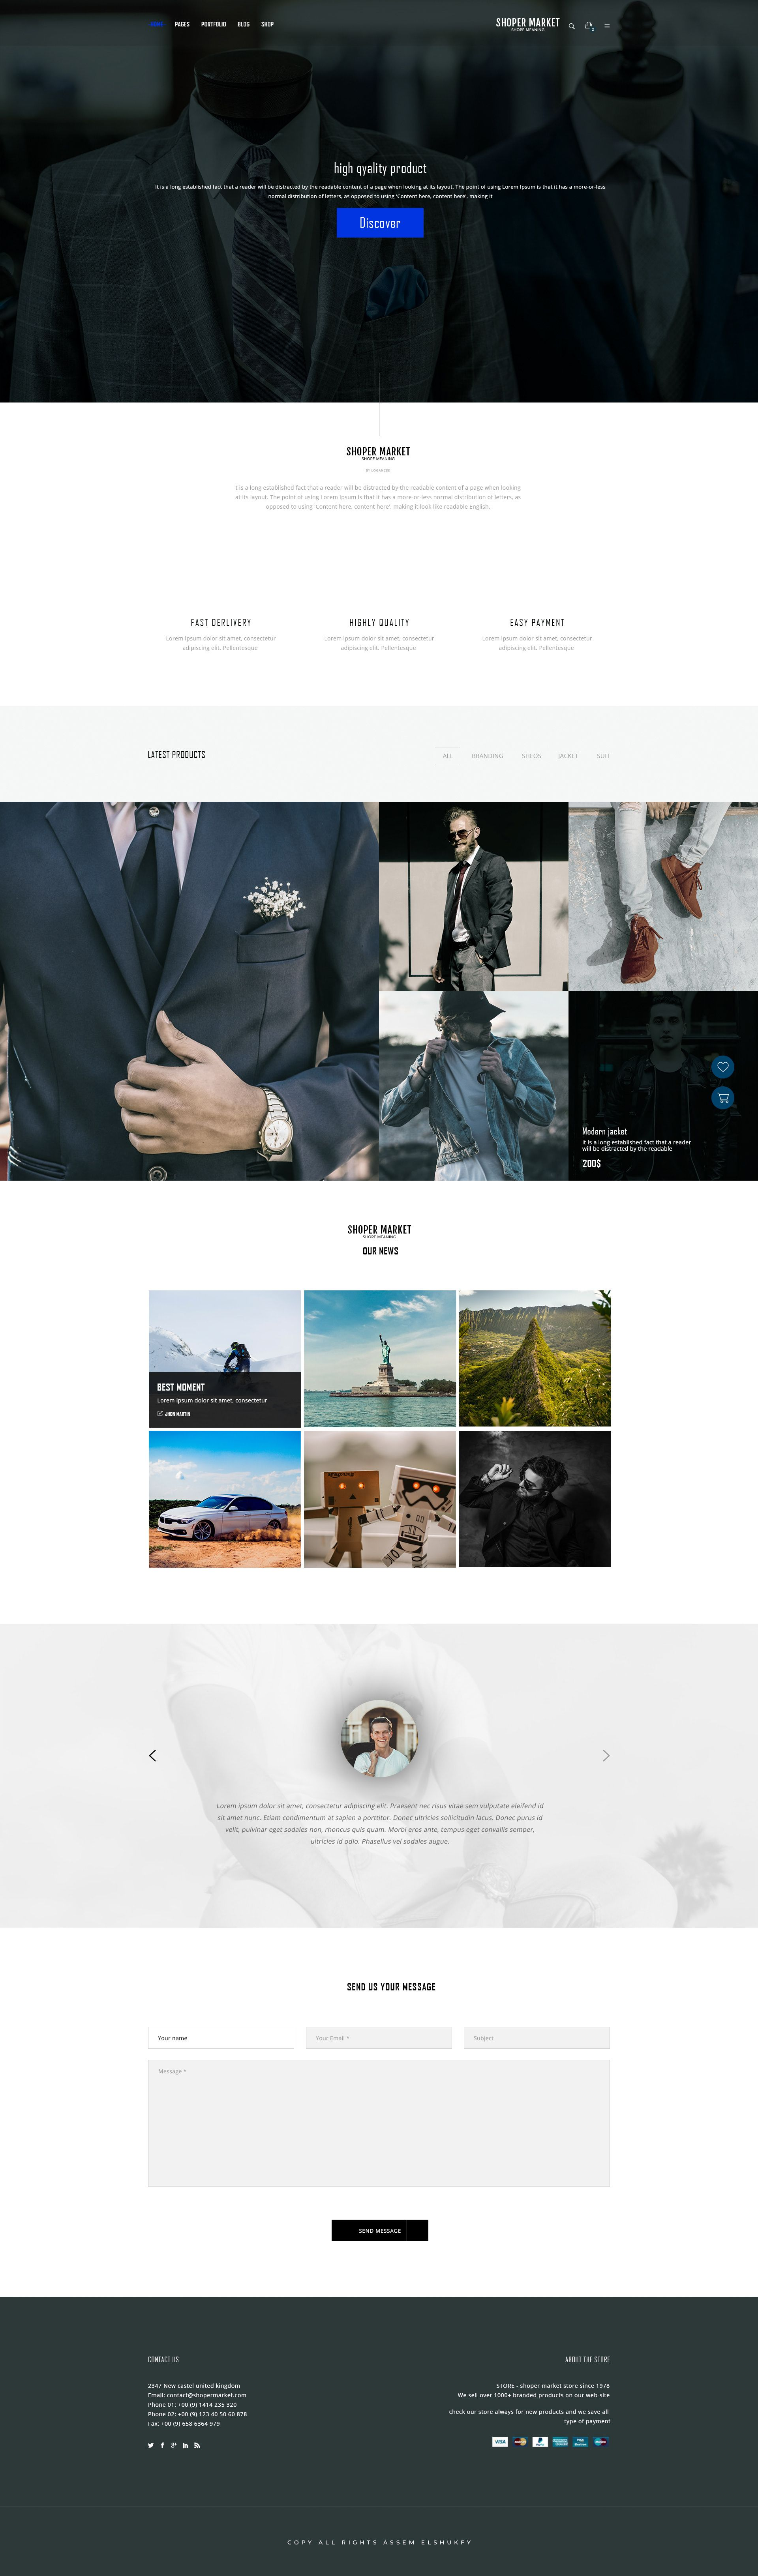 Pin on web sites modern designs